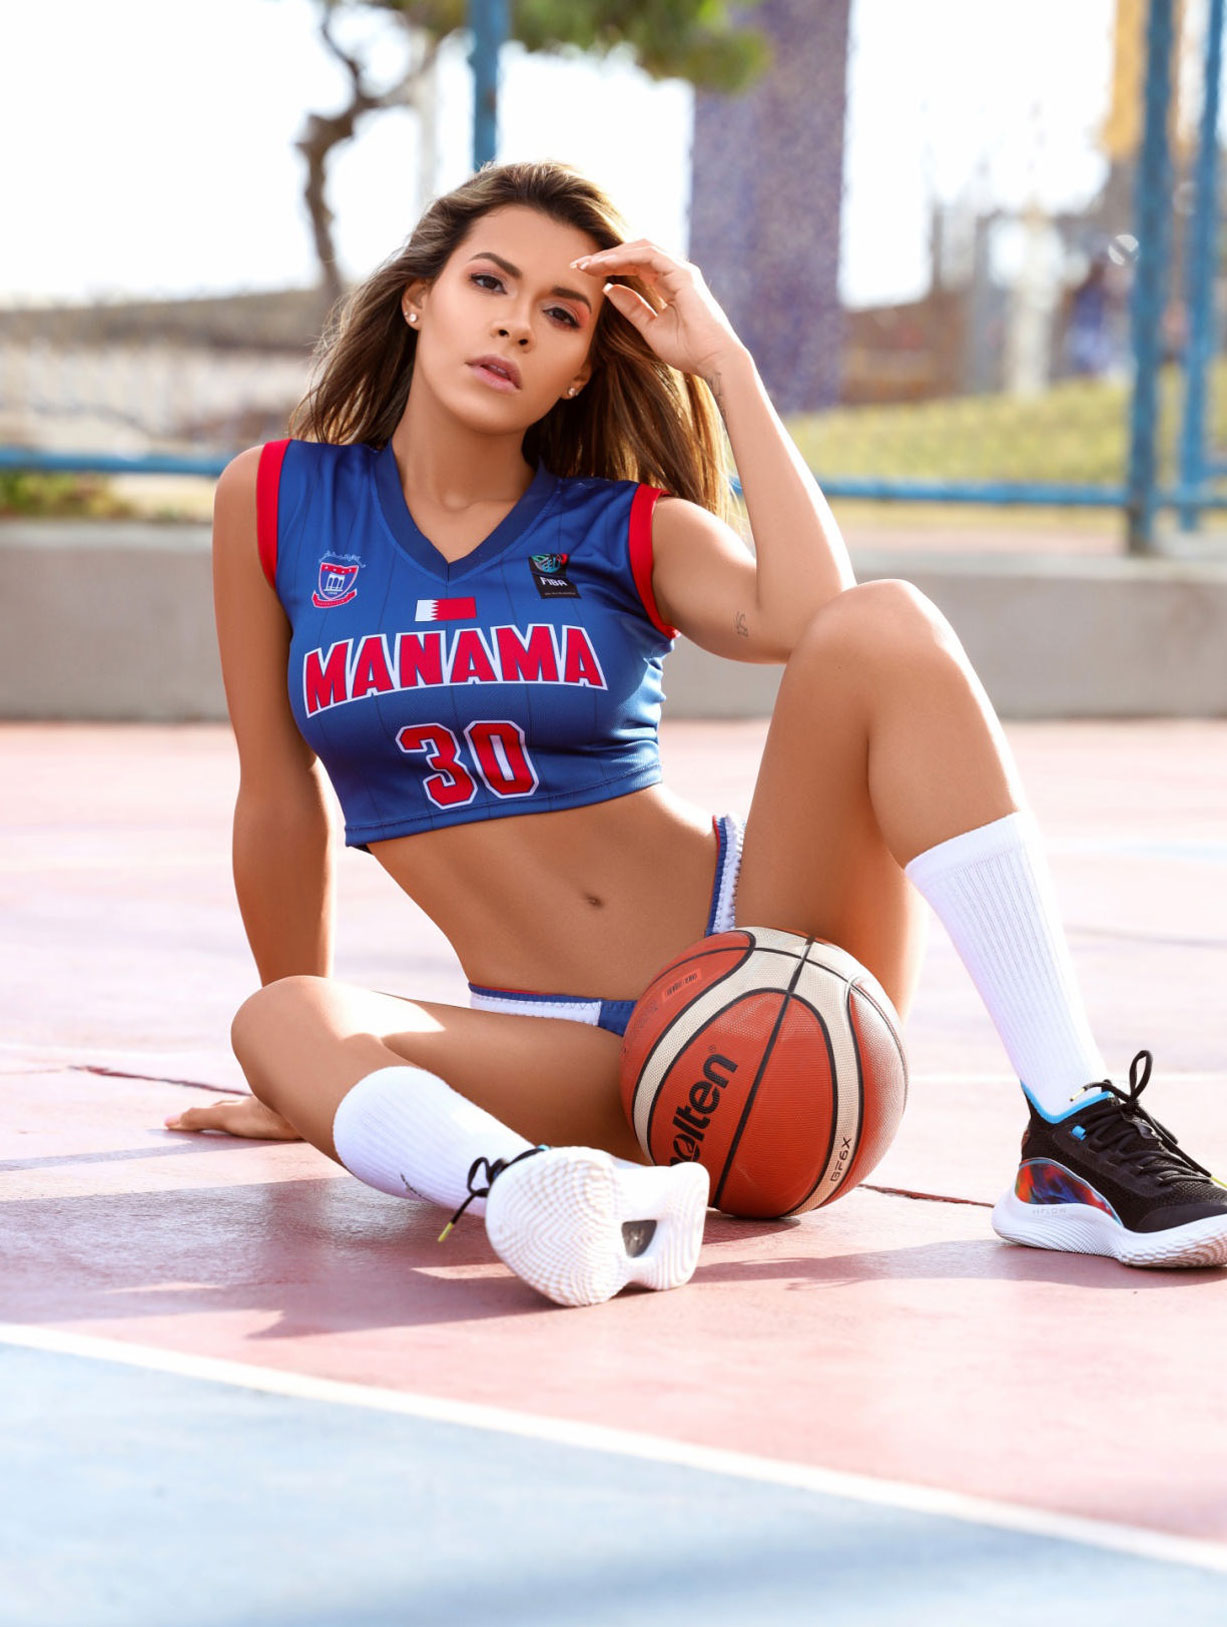 Луана Санден проводит разминку с баскетбольным мячом / фото 04